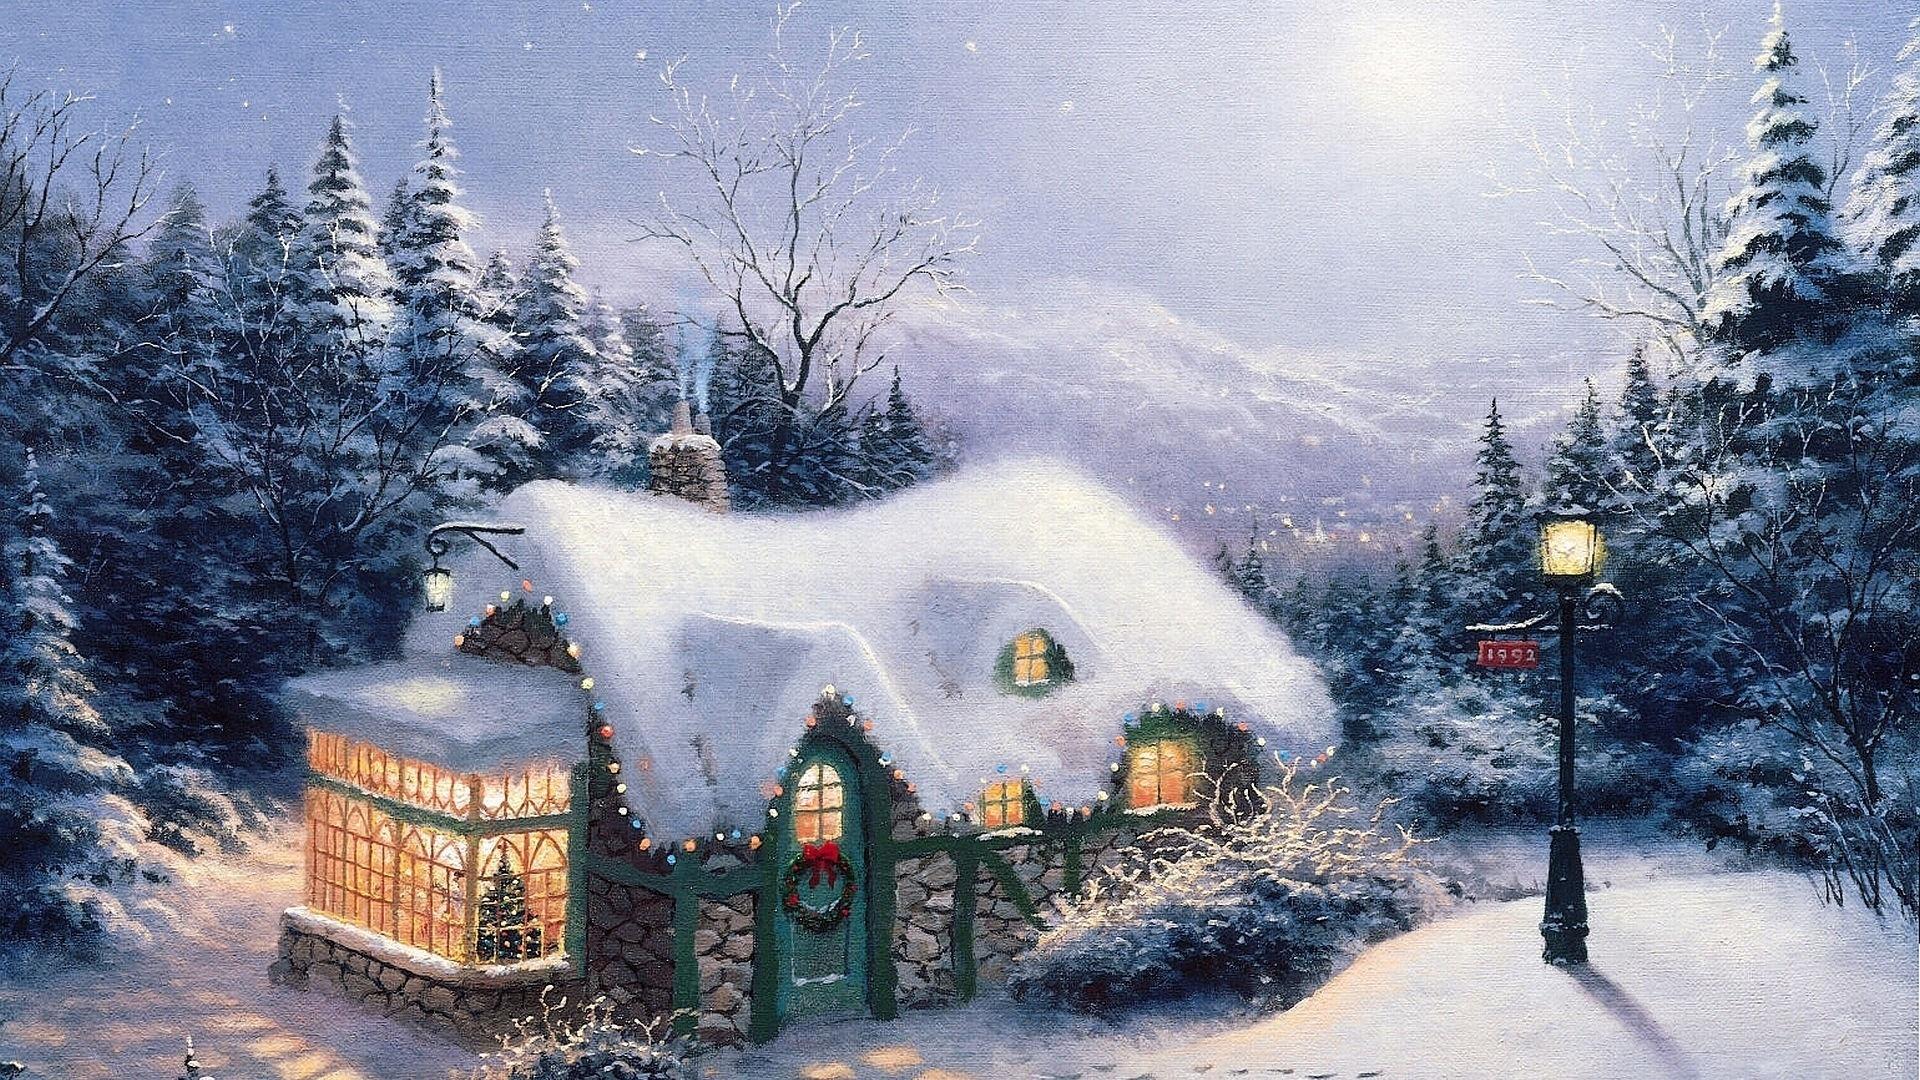 снег зима усадьба фазенда без смс